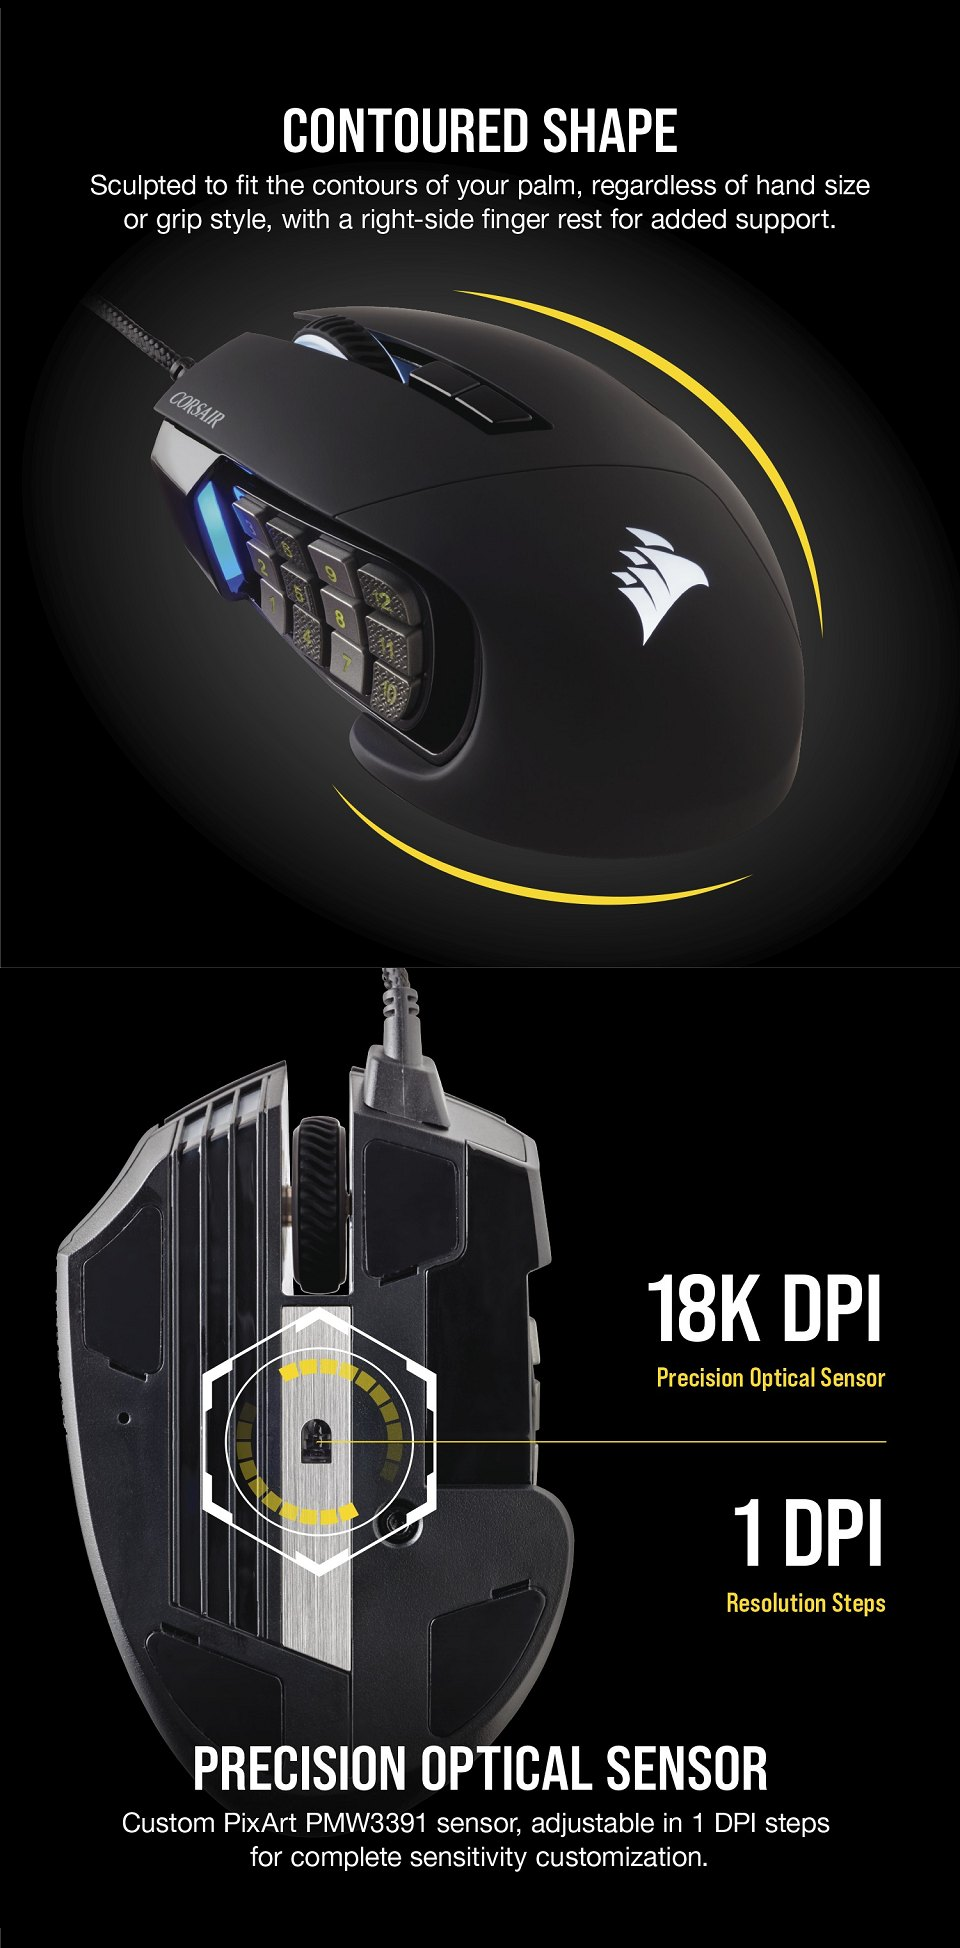 Corsair Scimitar Elite RGB Optical Gaming Mouse features 2